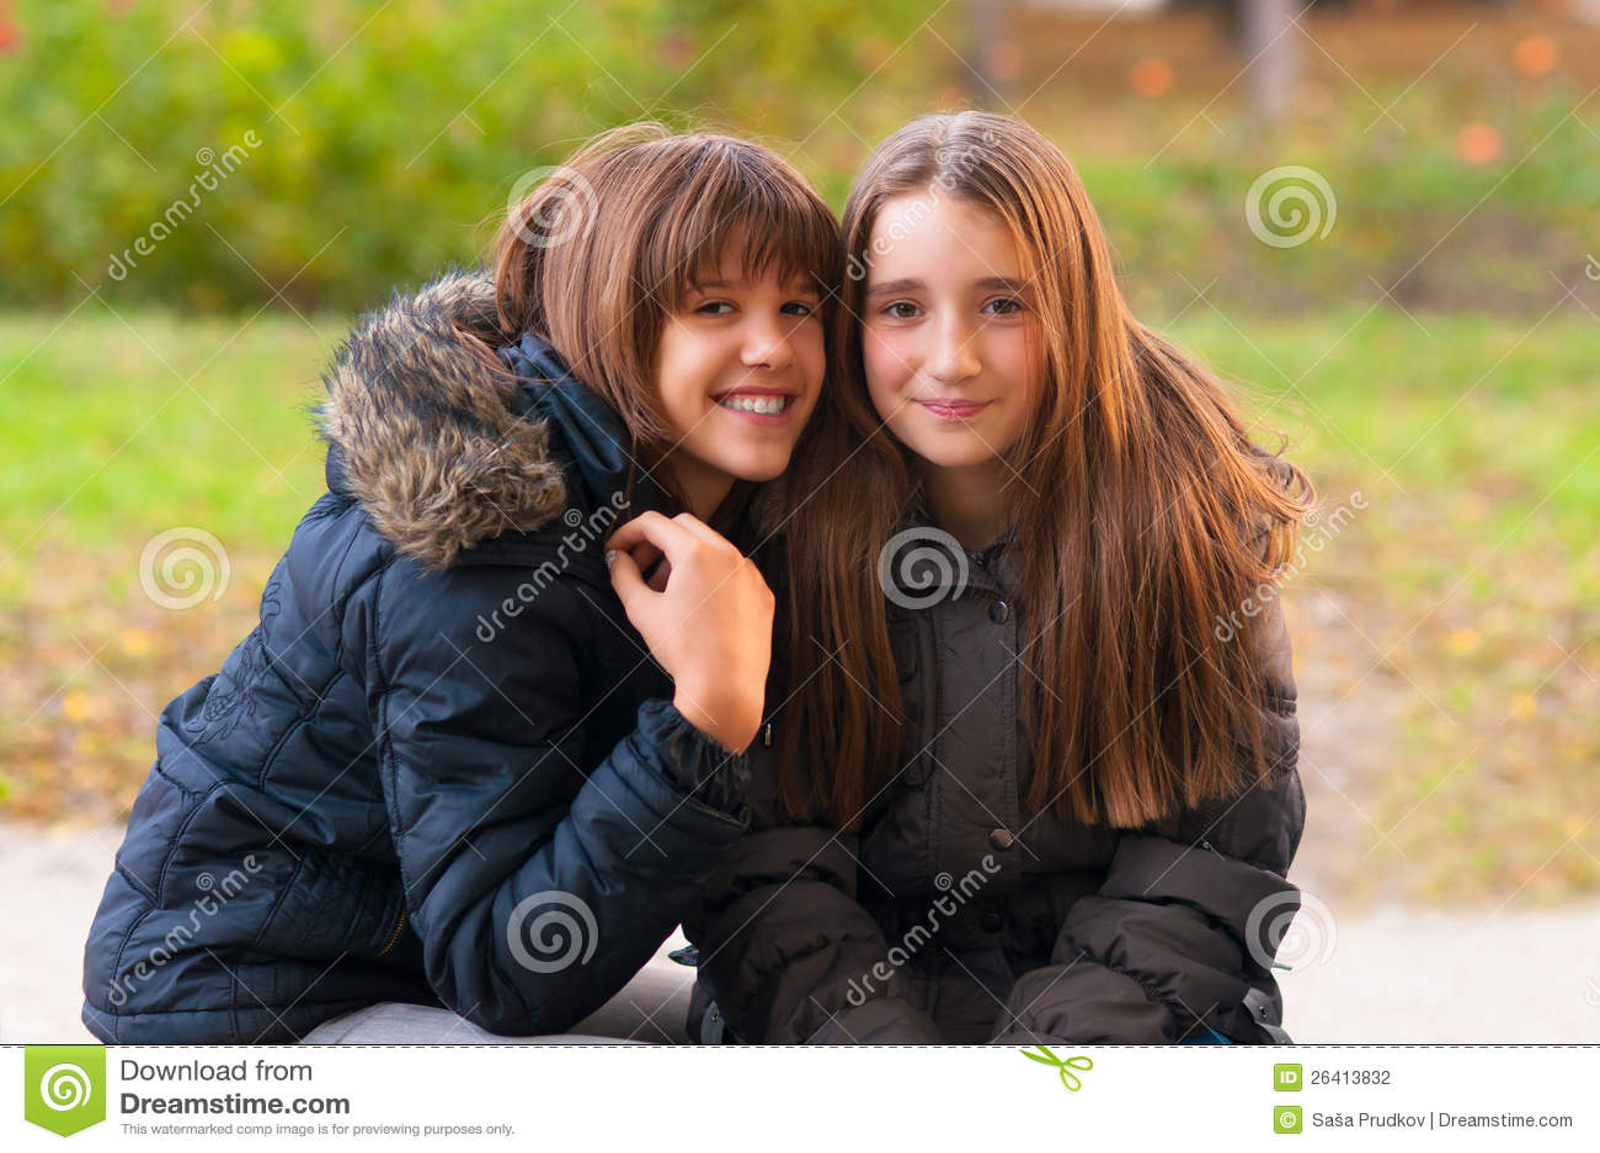 2 girls having fun in shower long hair hair 9